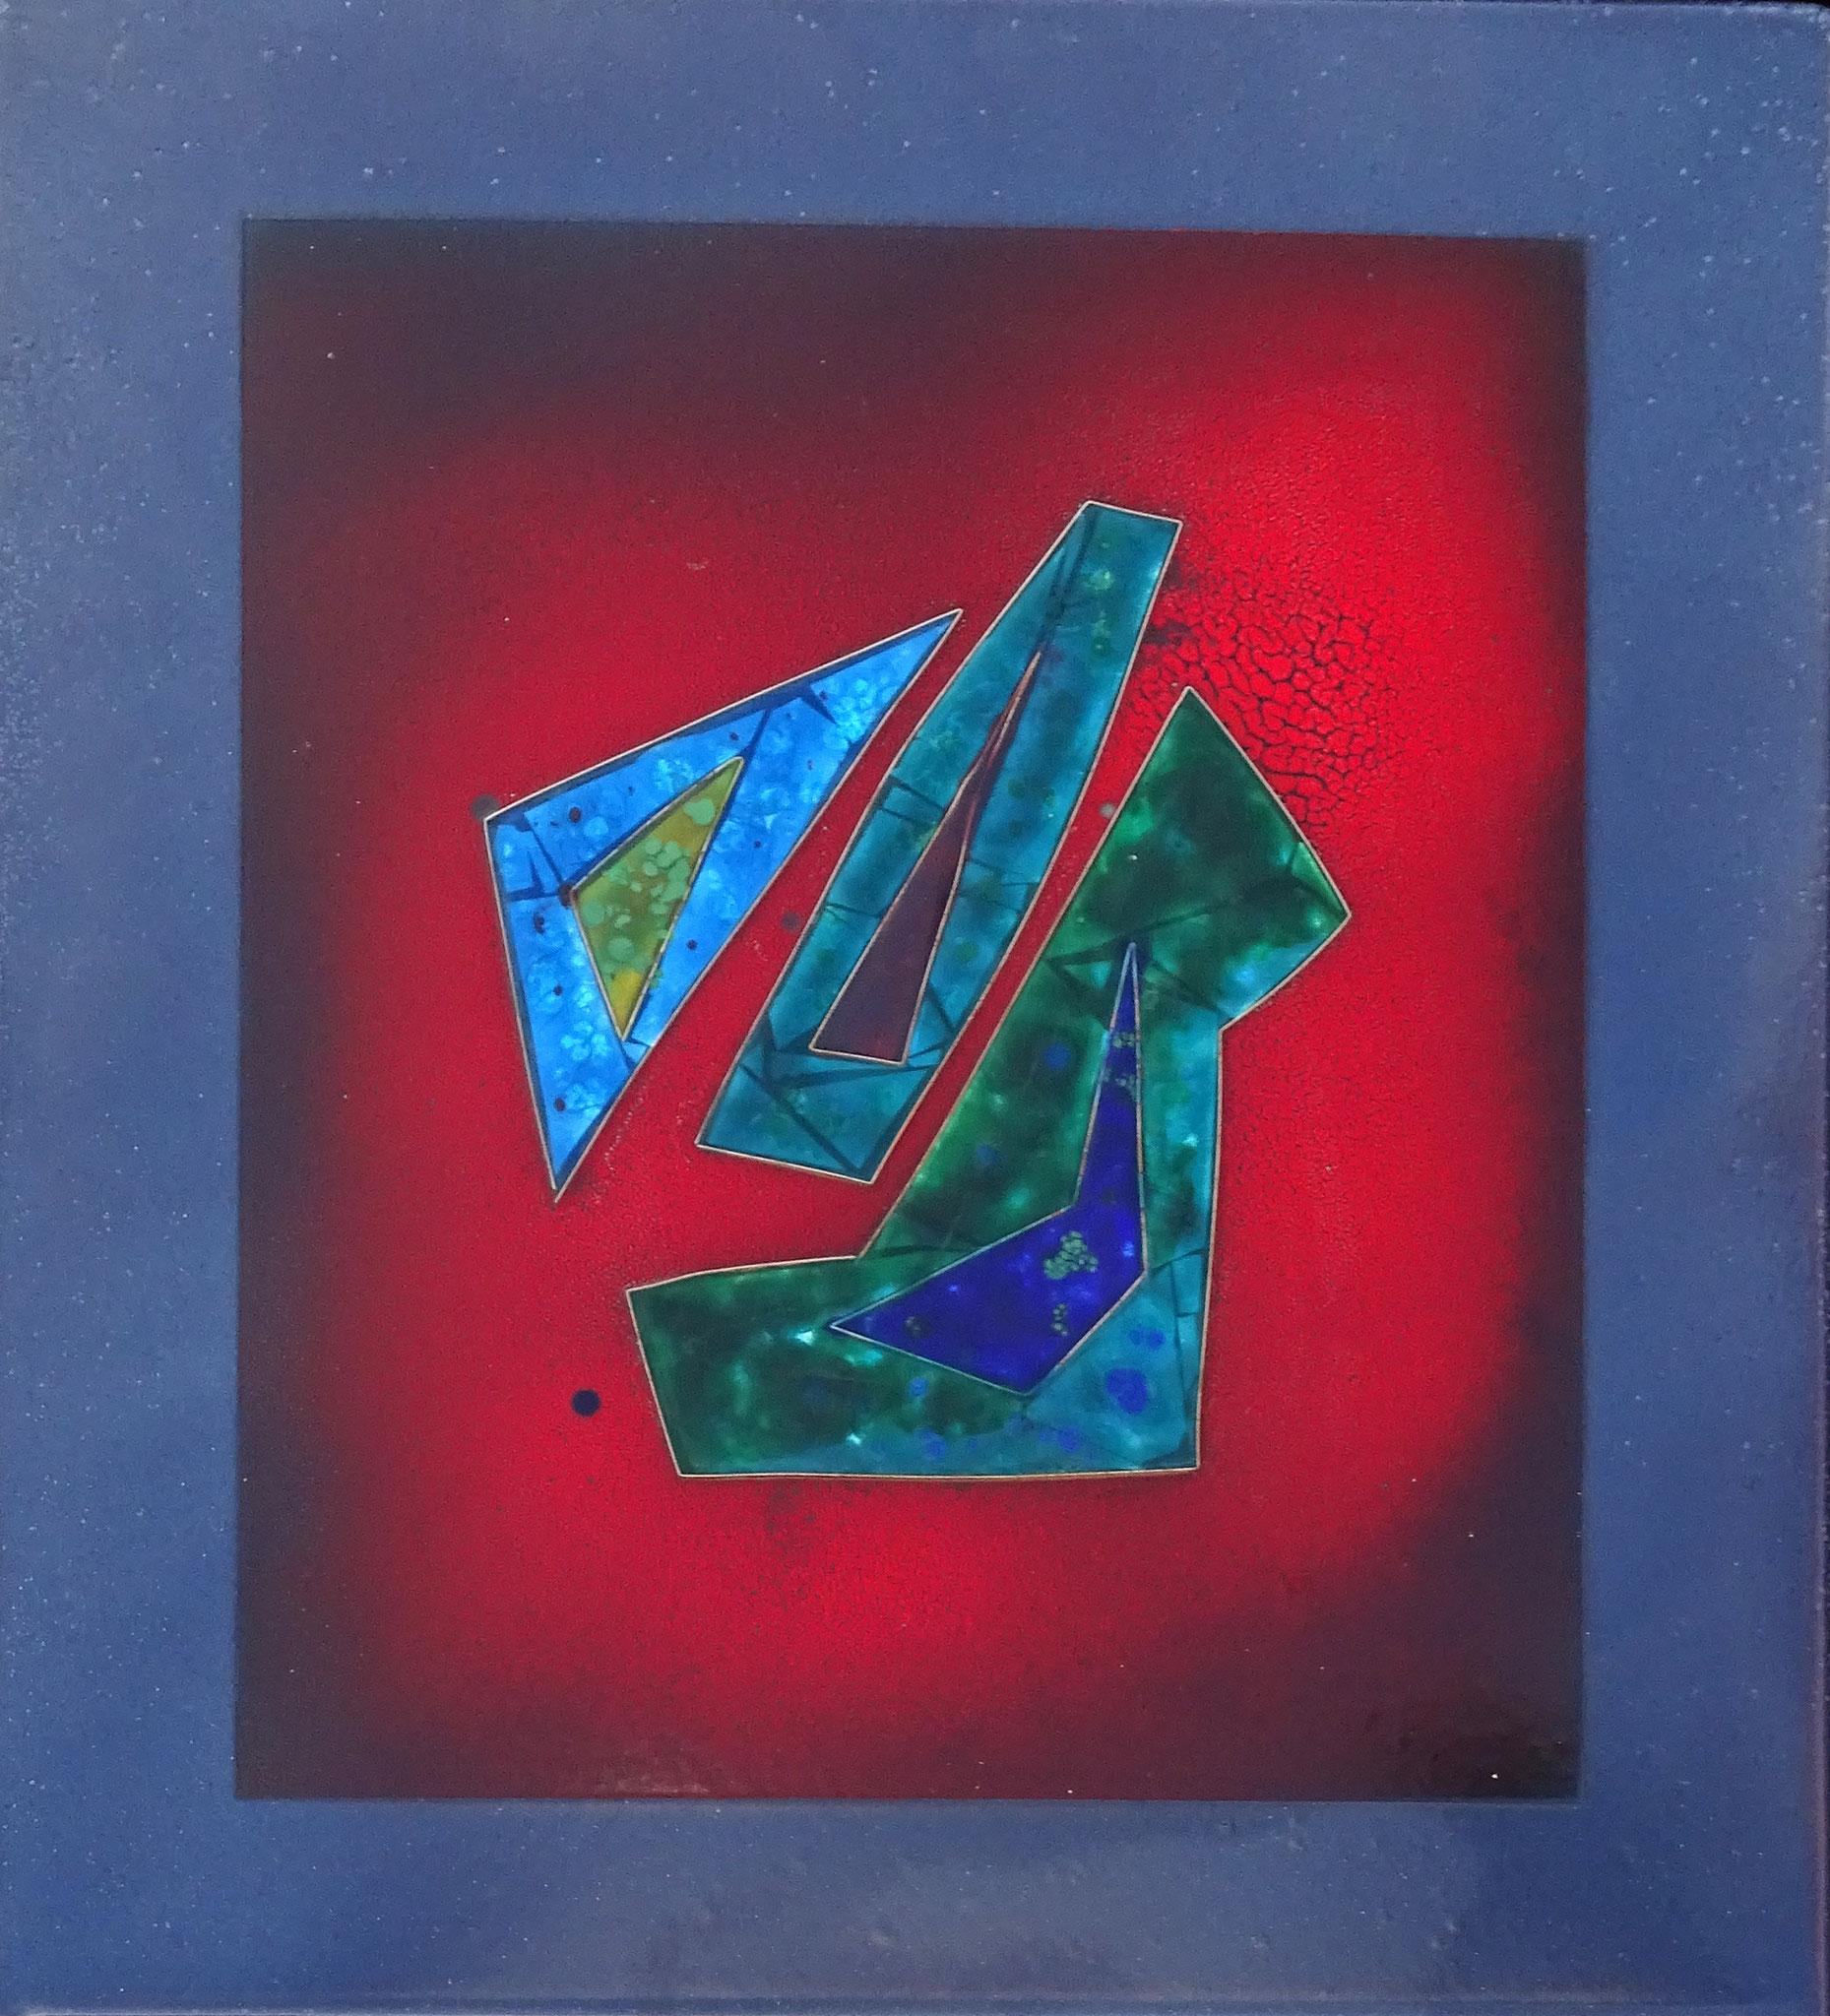 """Vater, Mutter,Kind"" 2015, 50 x 57 cm, Stegemail, Silberstege, transp.und opakes Email"